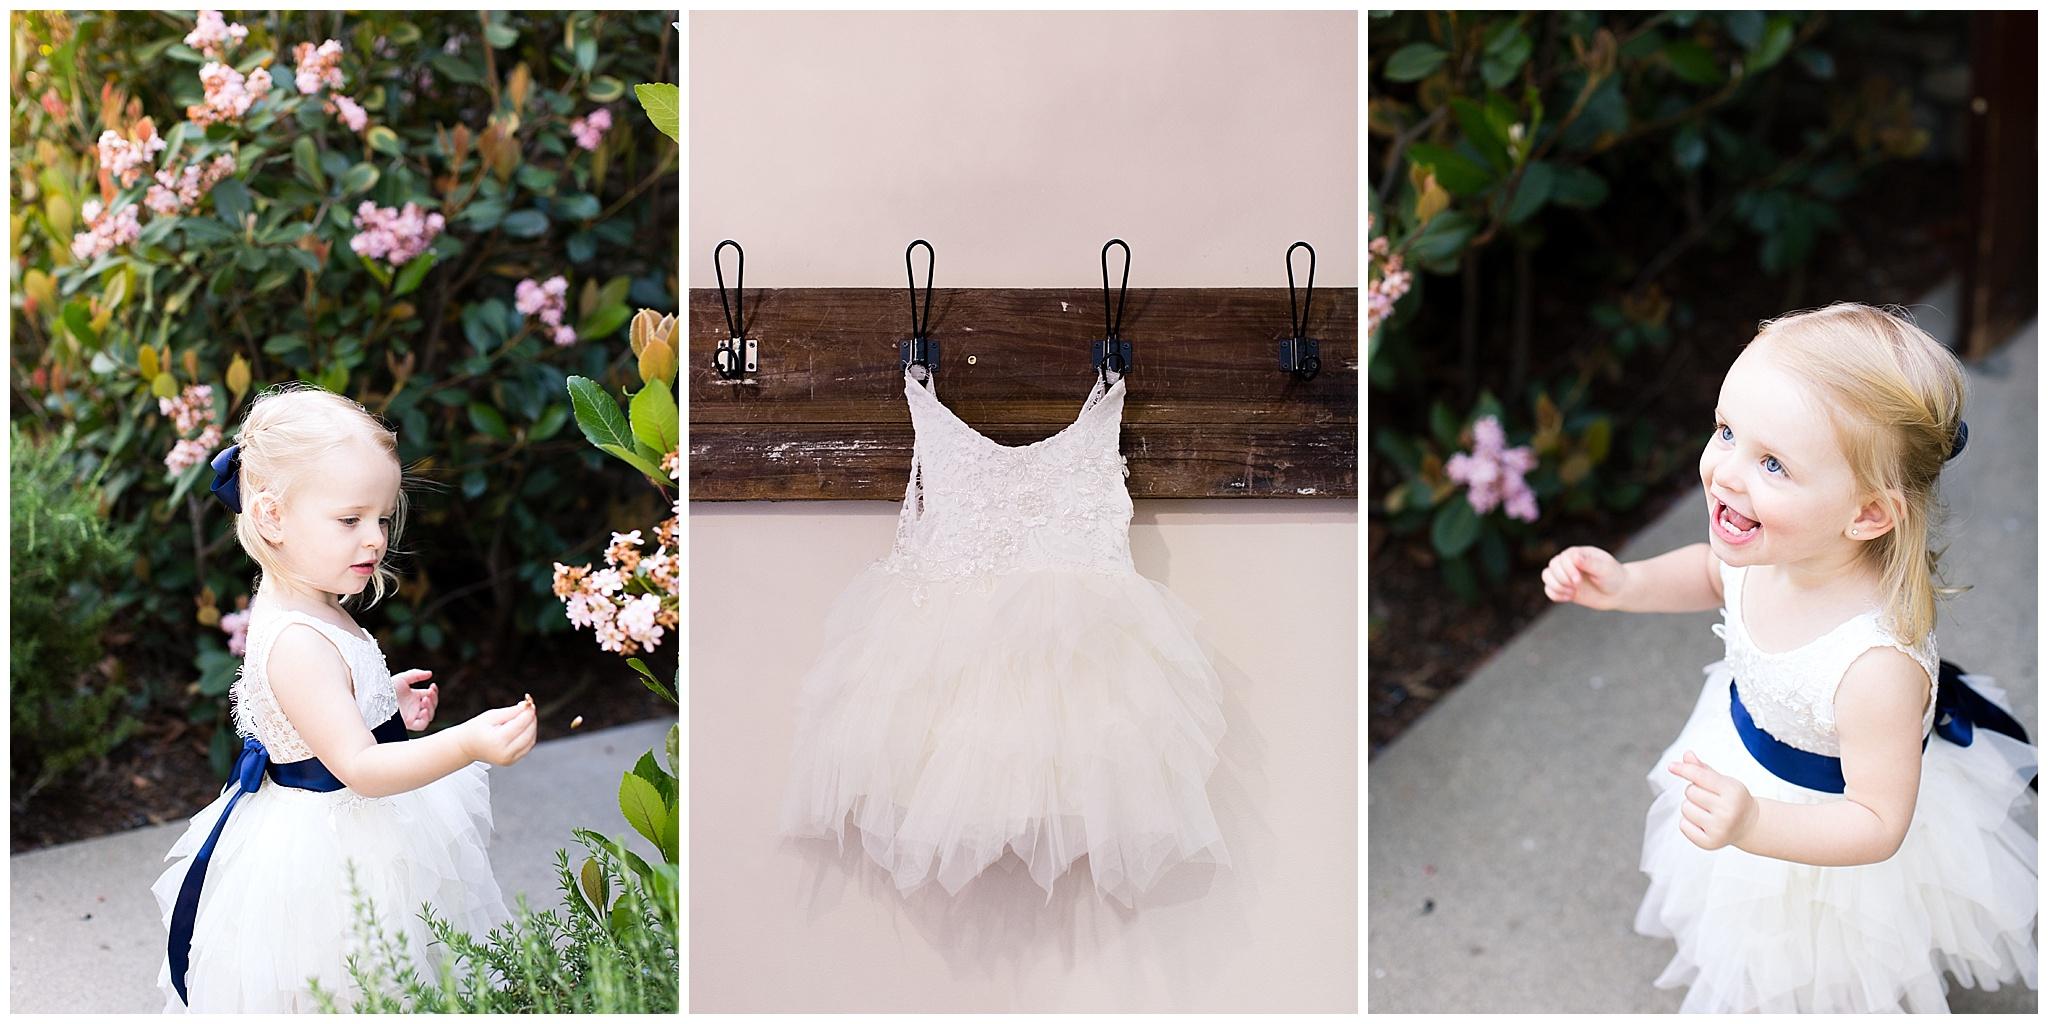 Vinny-Cayt-Wedding-04-26-18-0454.jpg